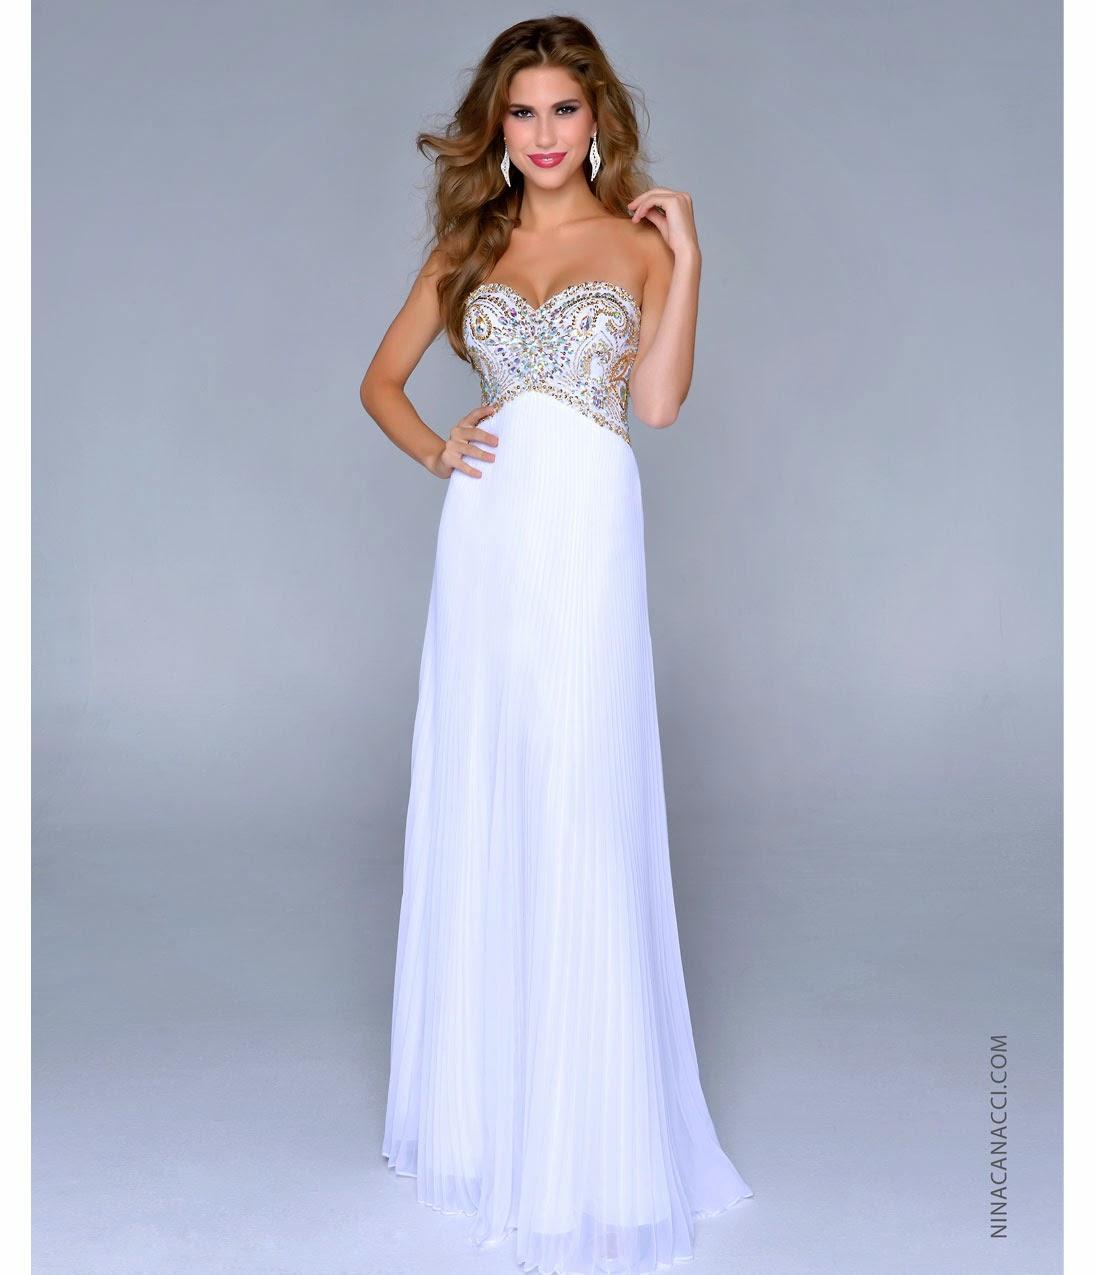 Prom Dresses Under $50 - Plus Size Prom Dresses